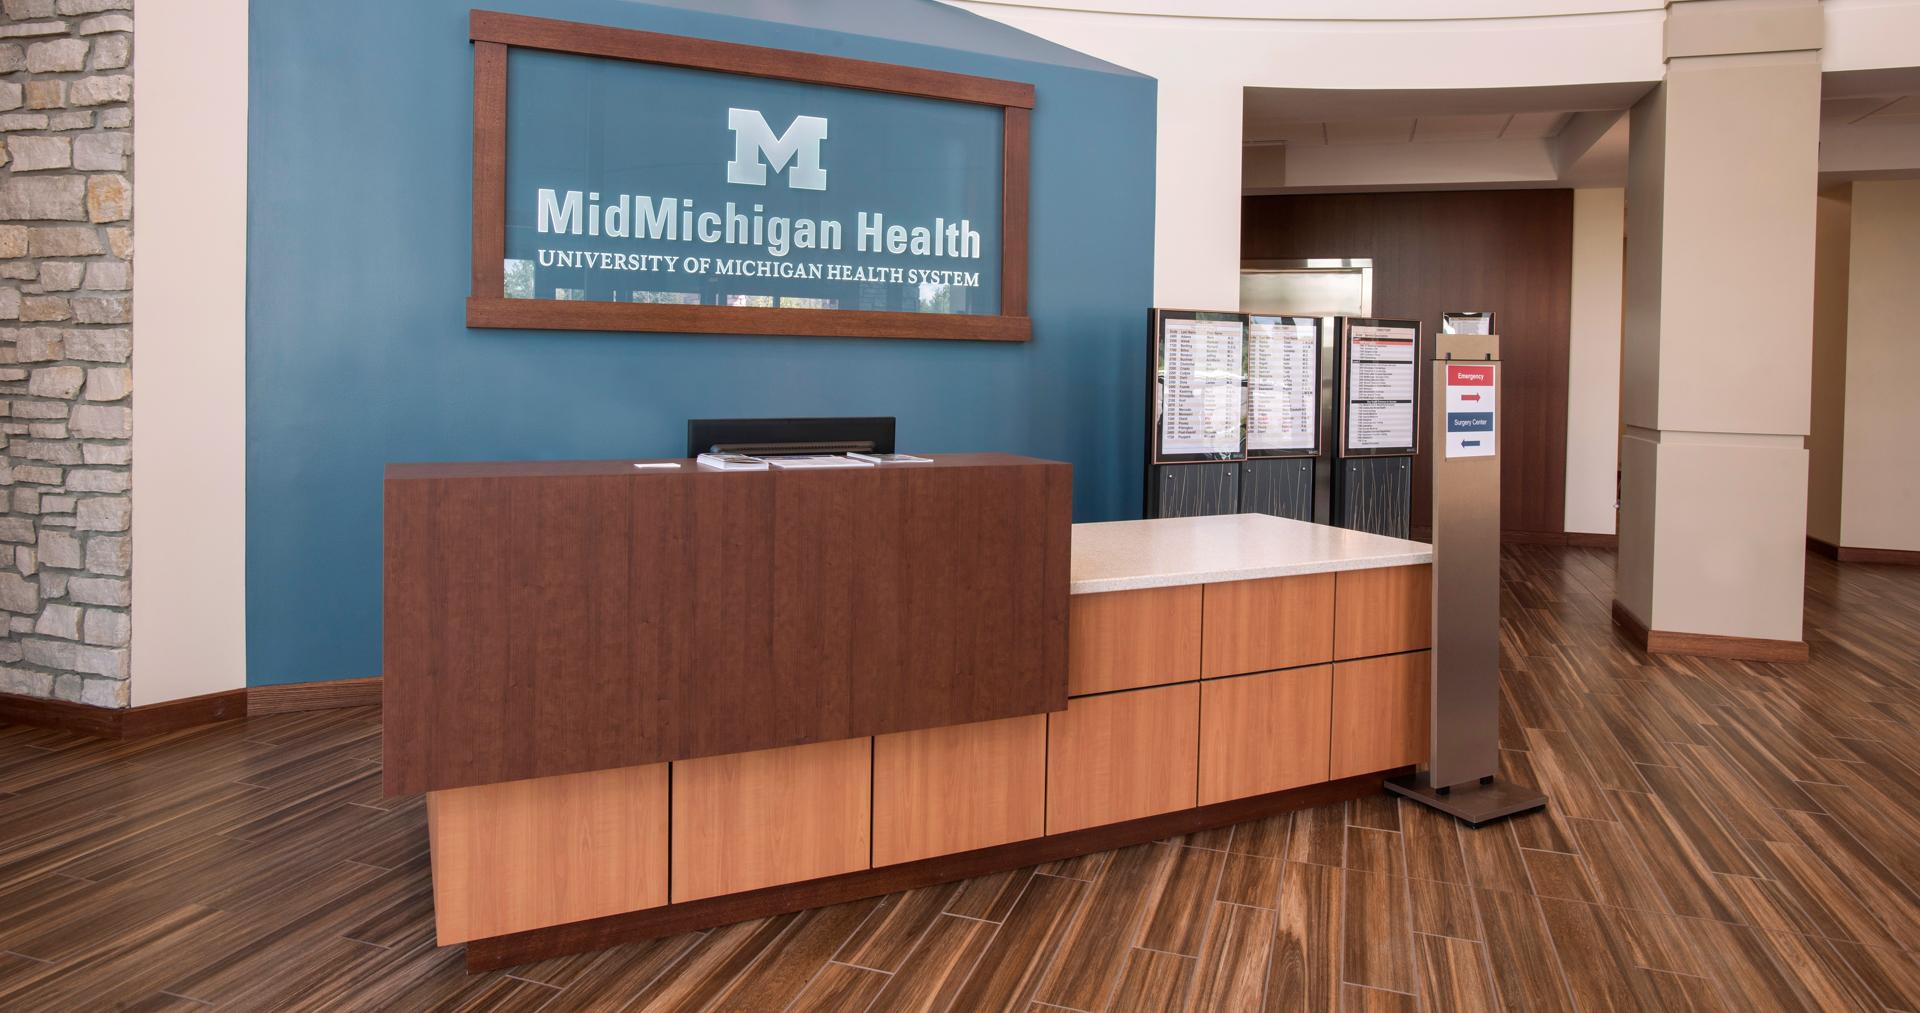 NBS_1920x1013_MidMichigan-Health_Reception_NBS.MM.2017.8.15.002